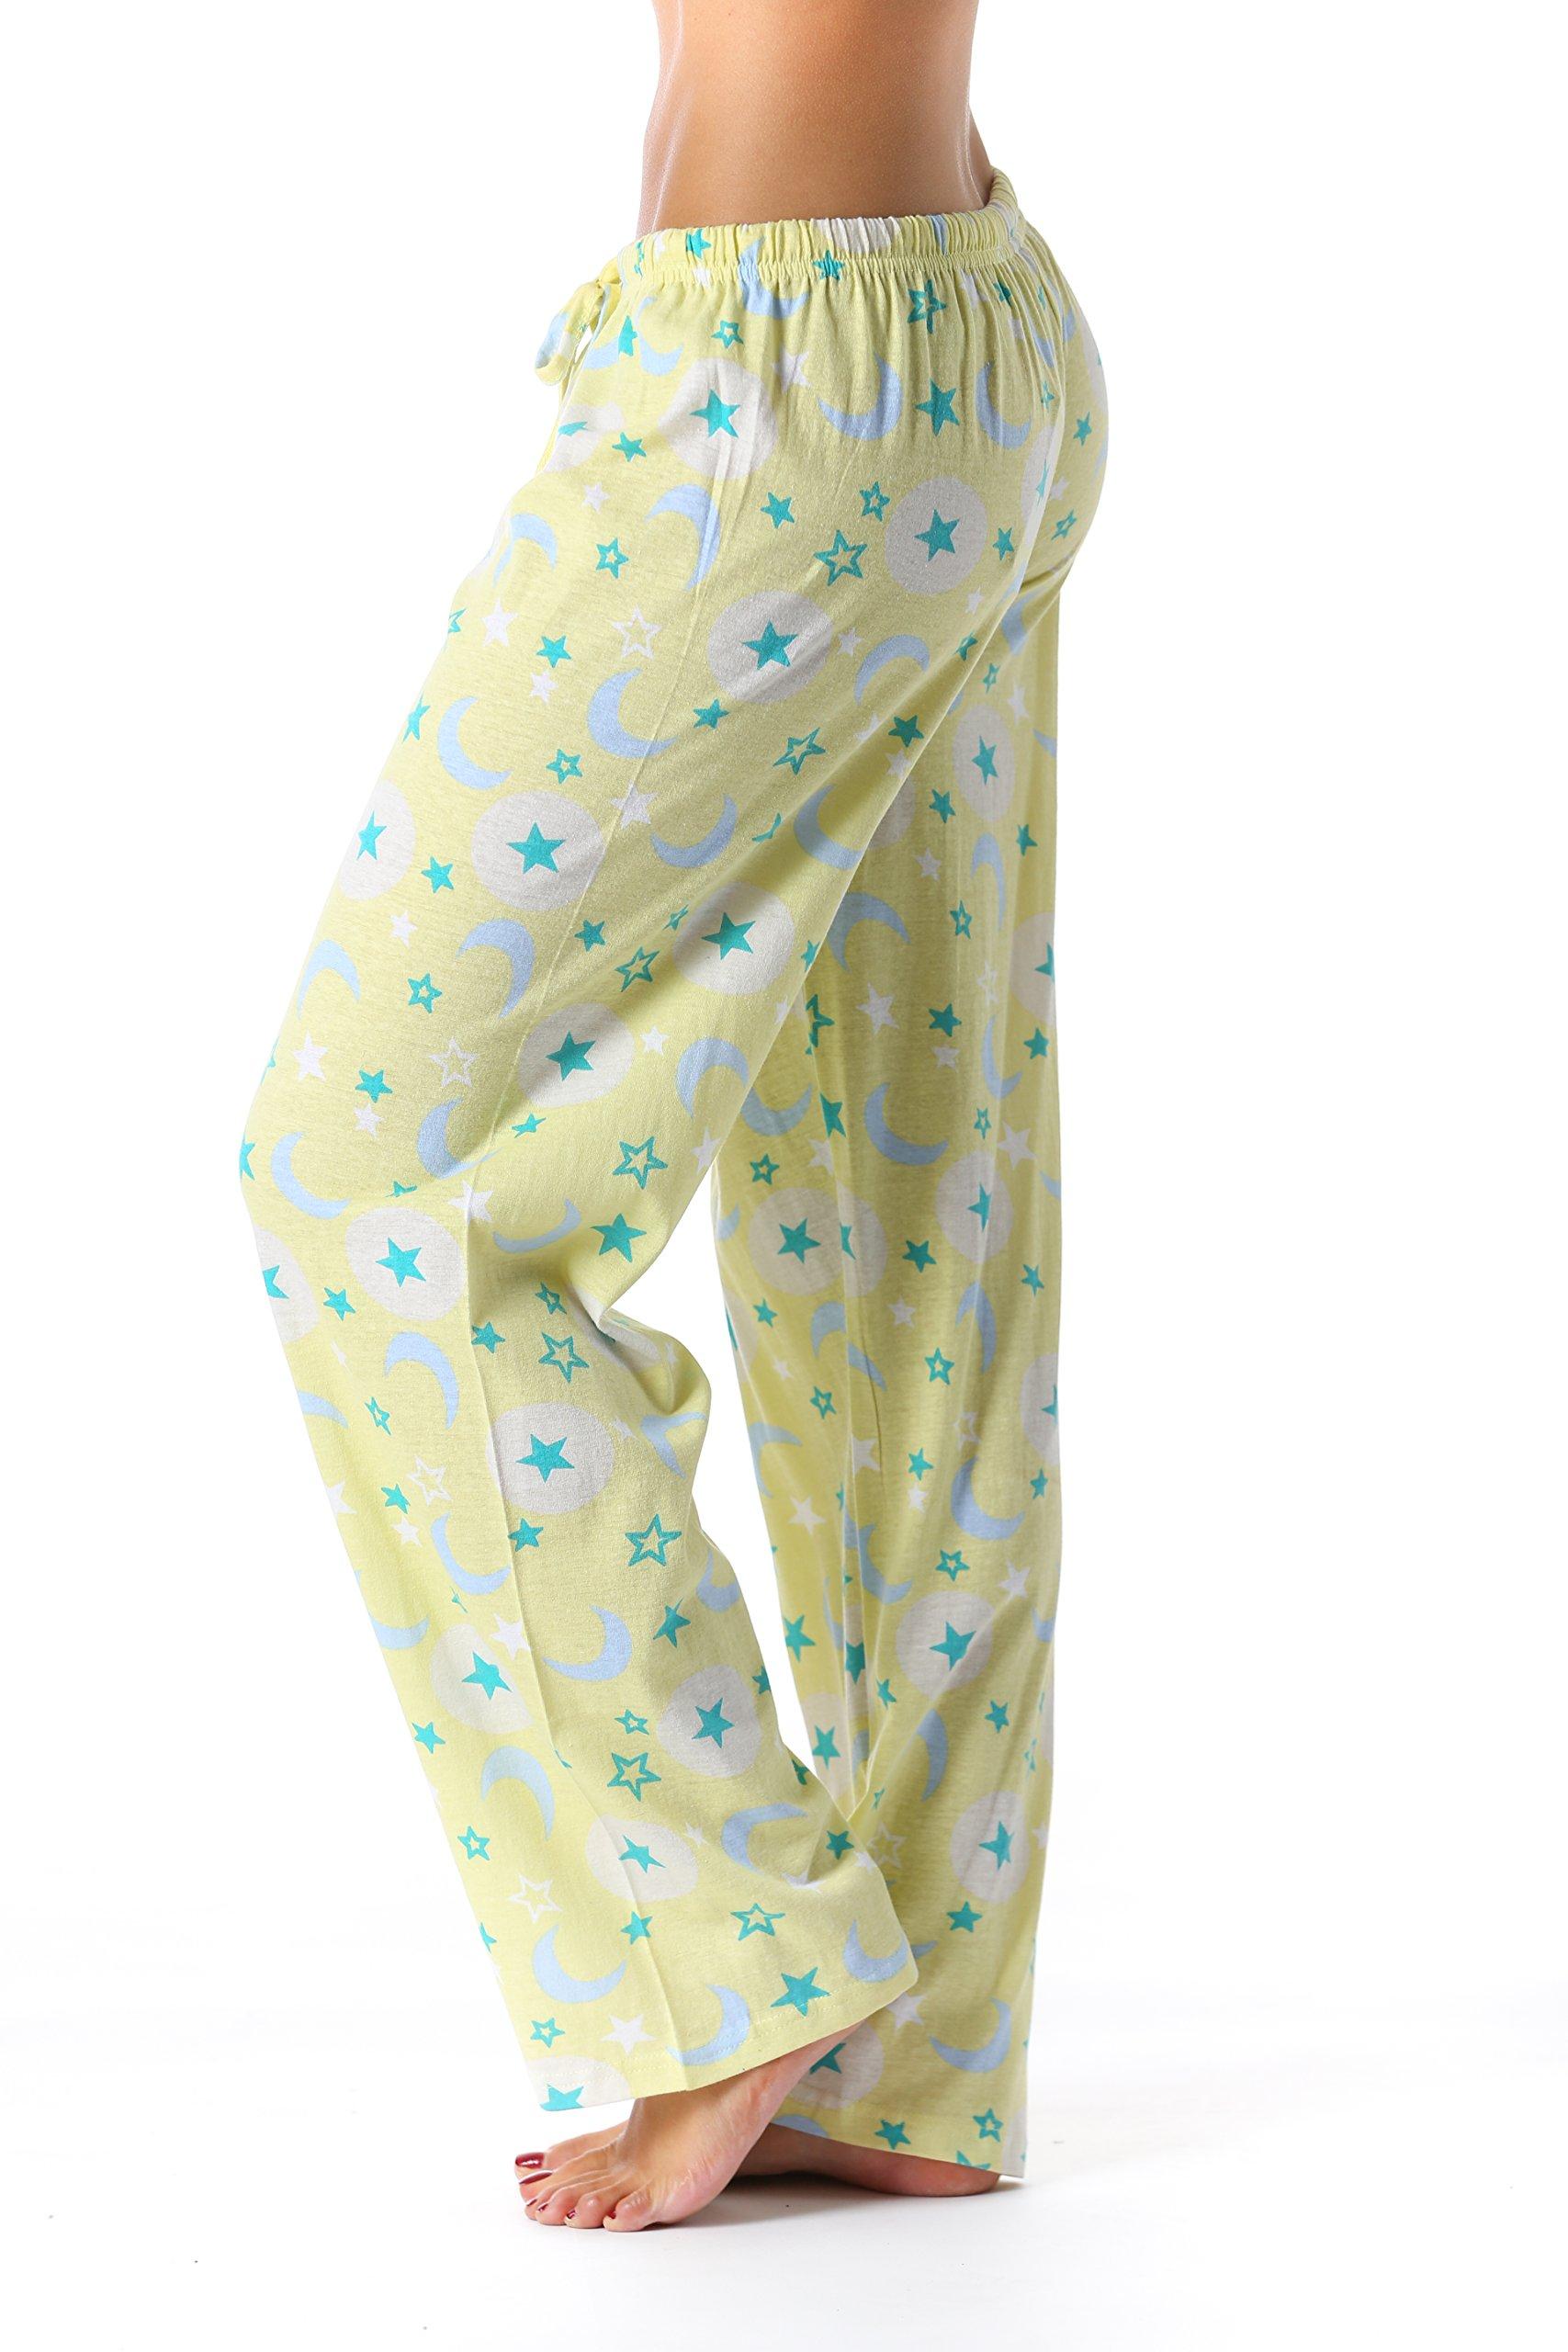 Just Love 6324-10061-S Women Pajama Pants/Sleepwear, Celestial Glow, Small by Just Love (Image #2)